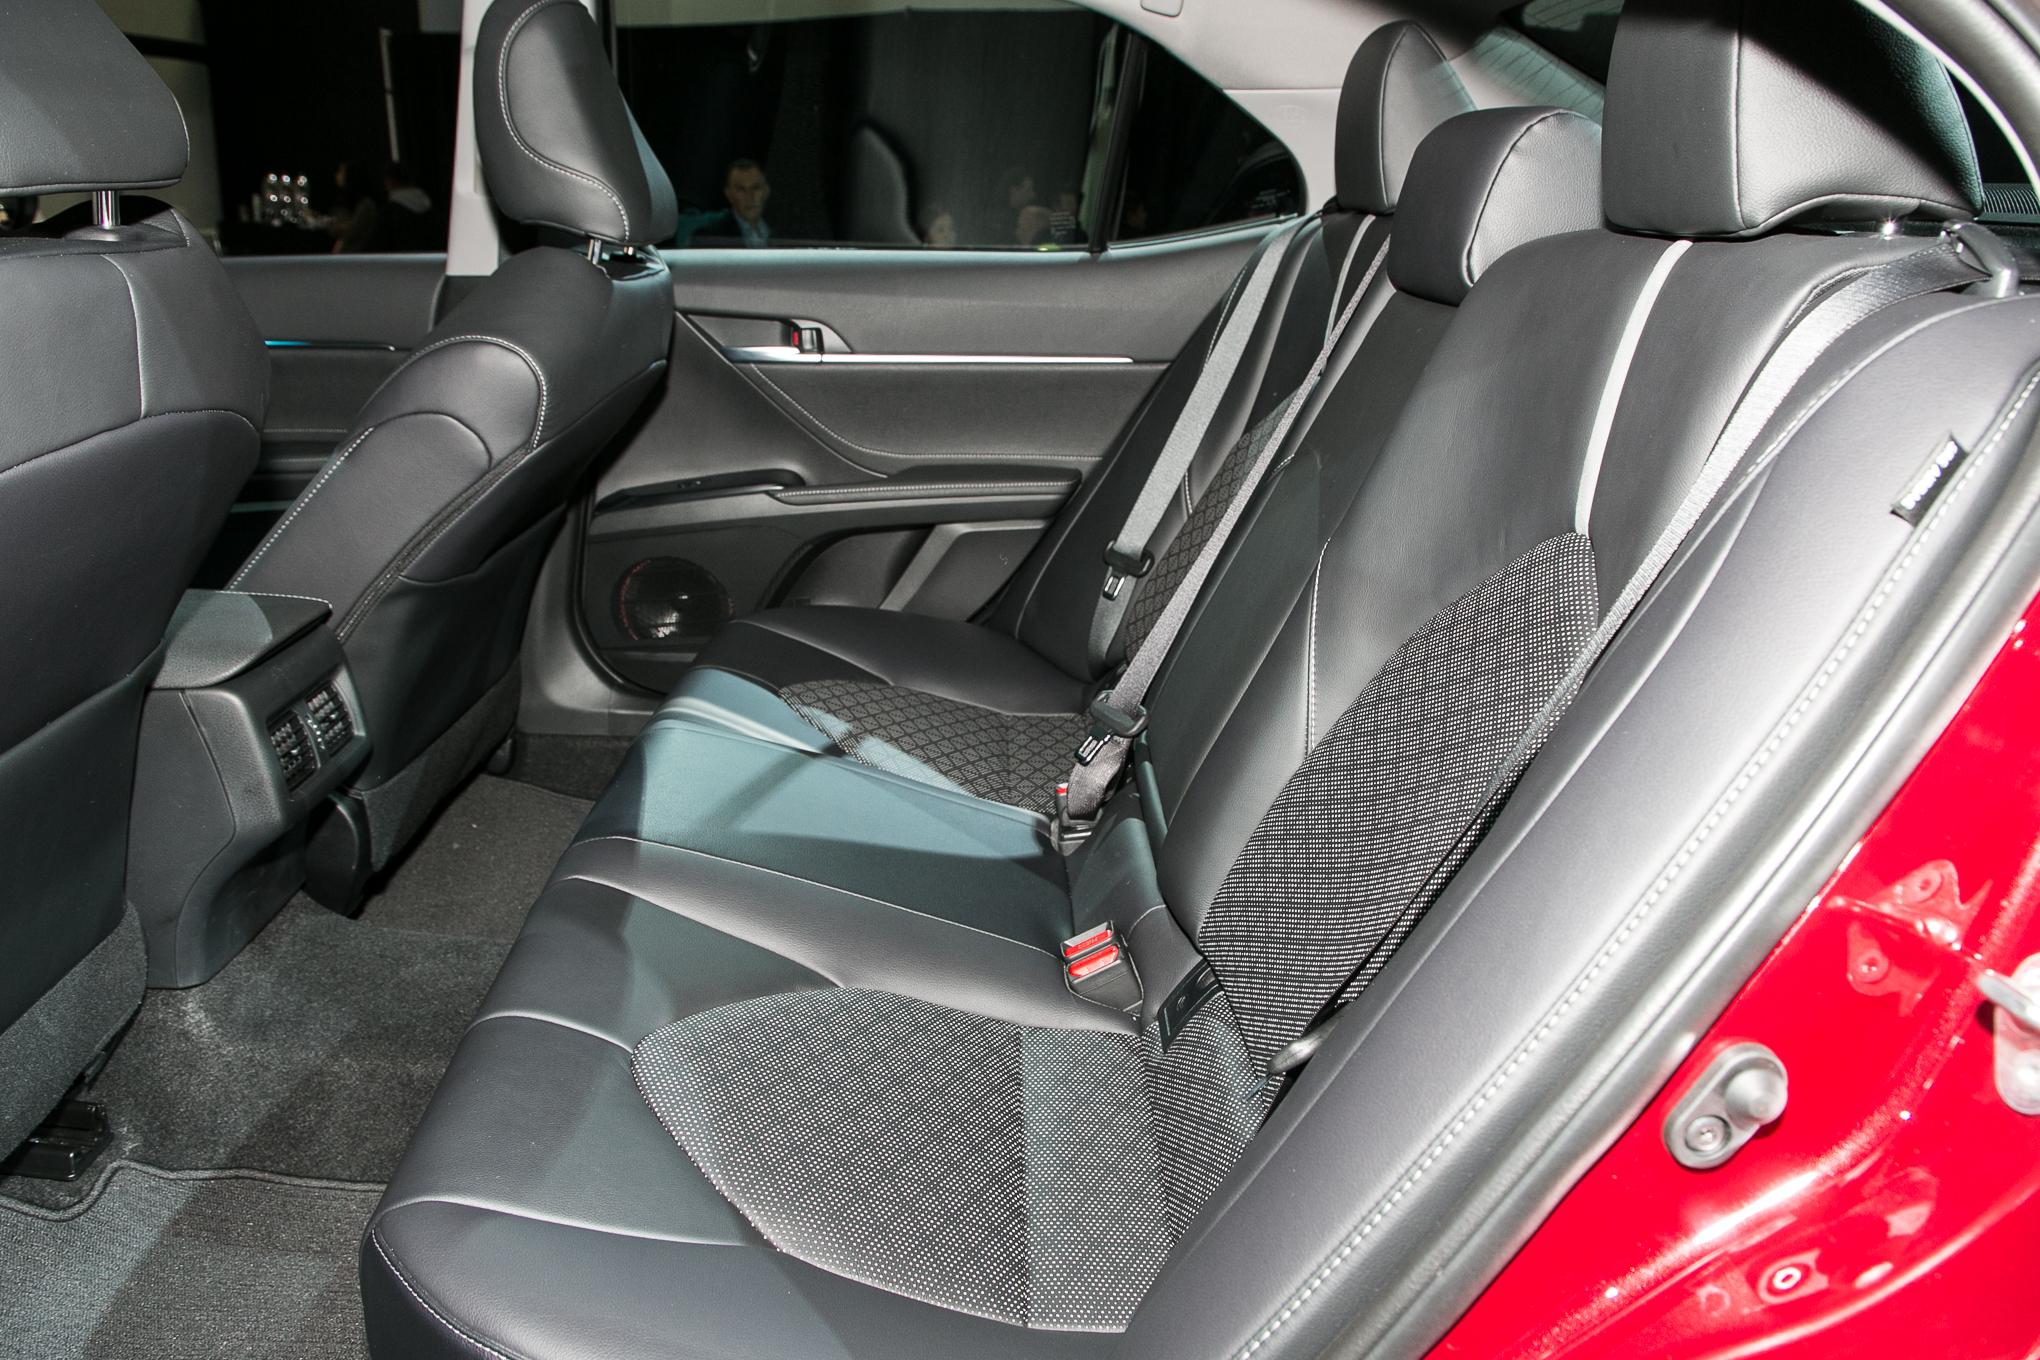 2018 Toyota Camry XSE 6